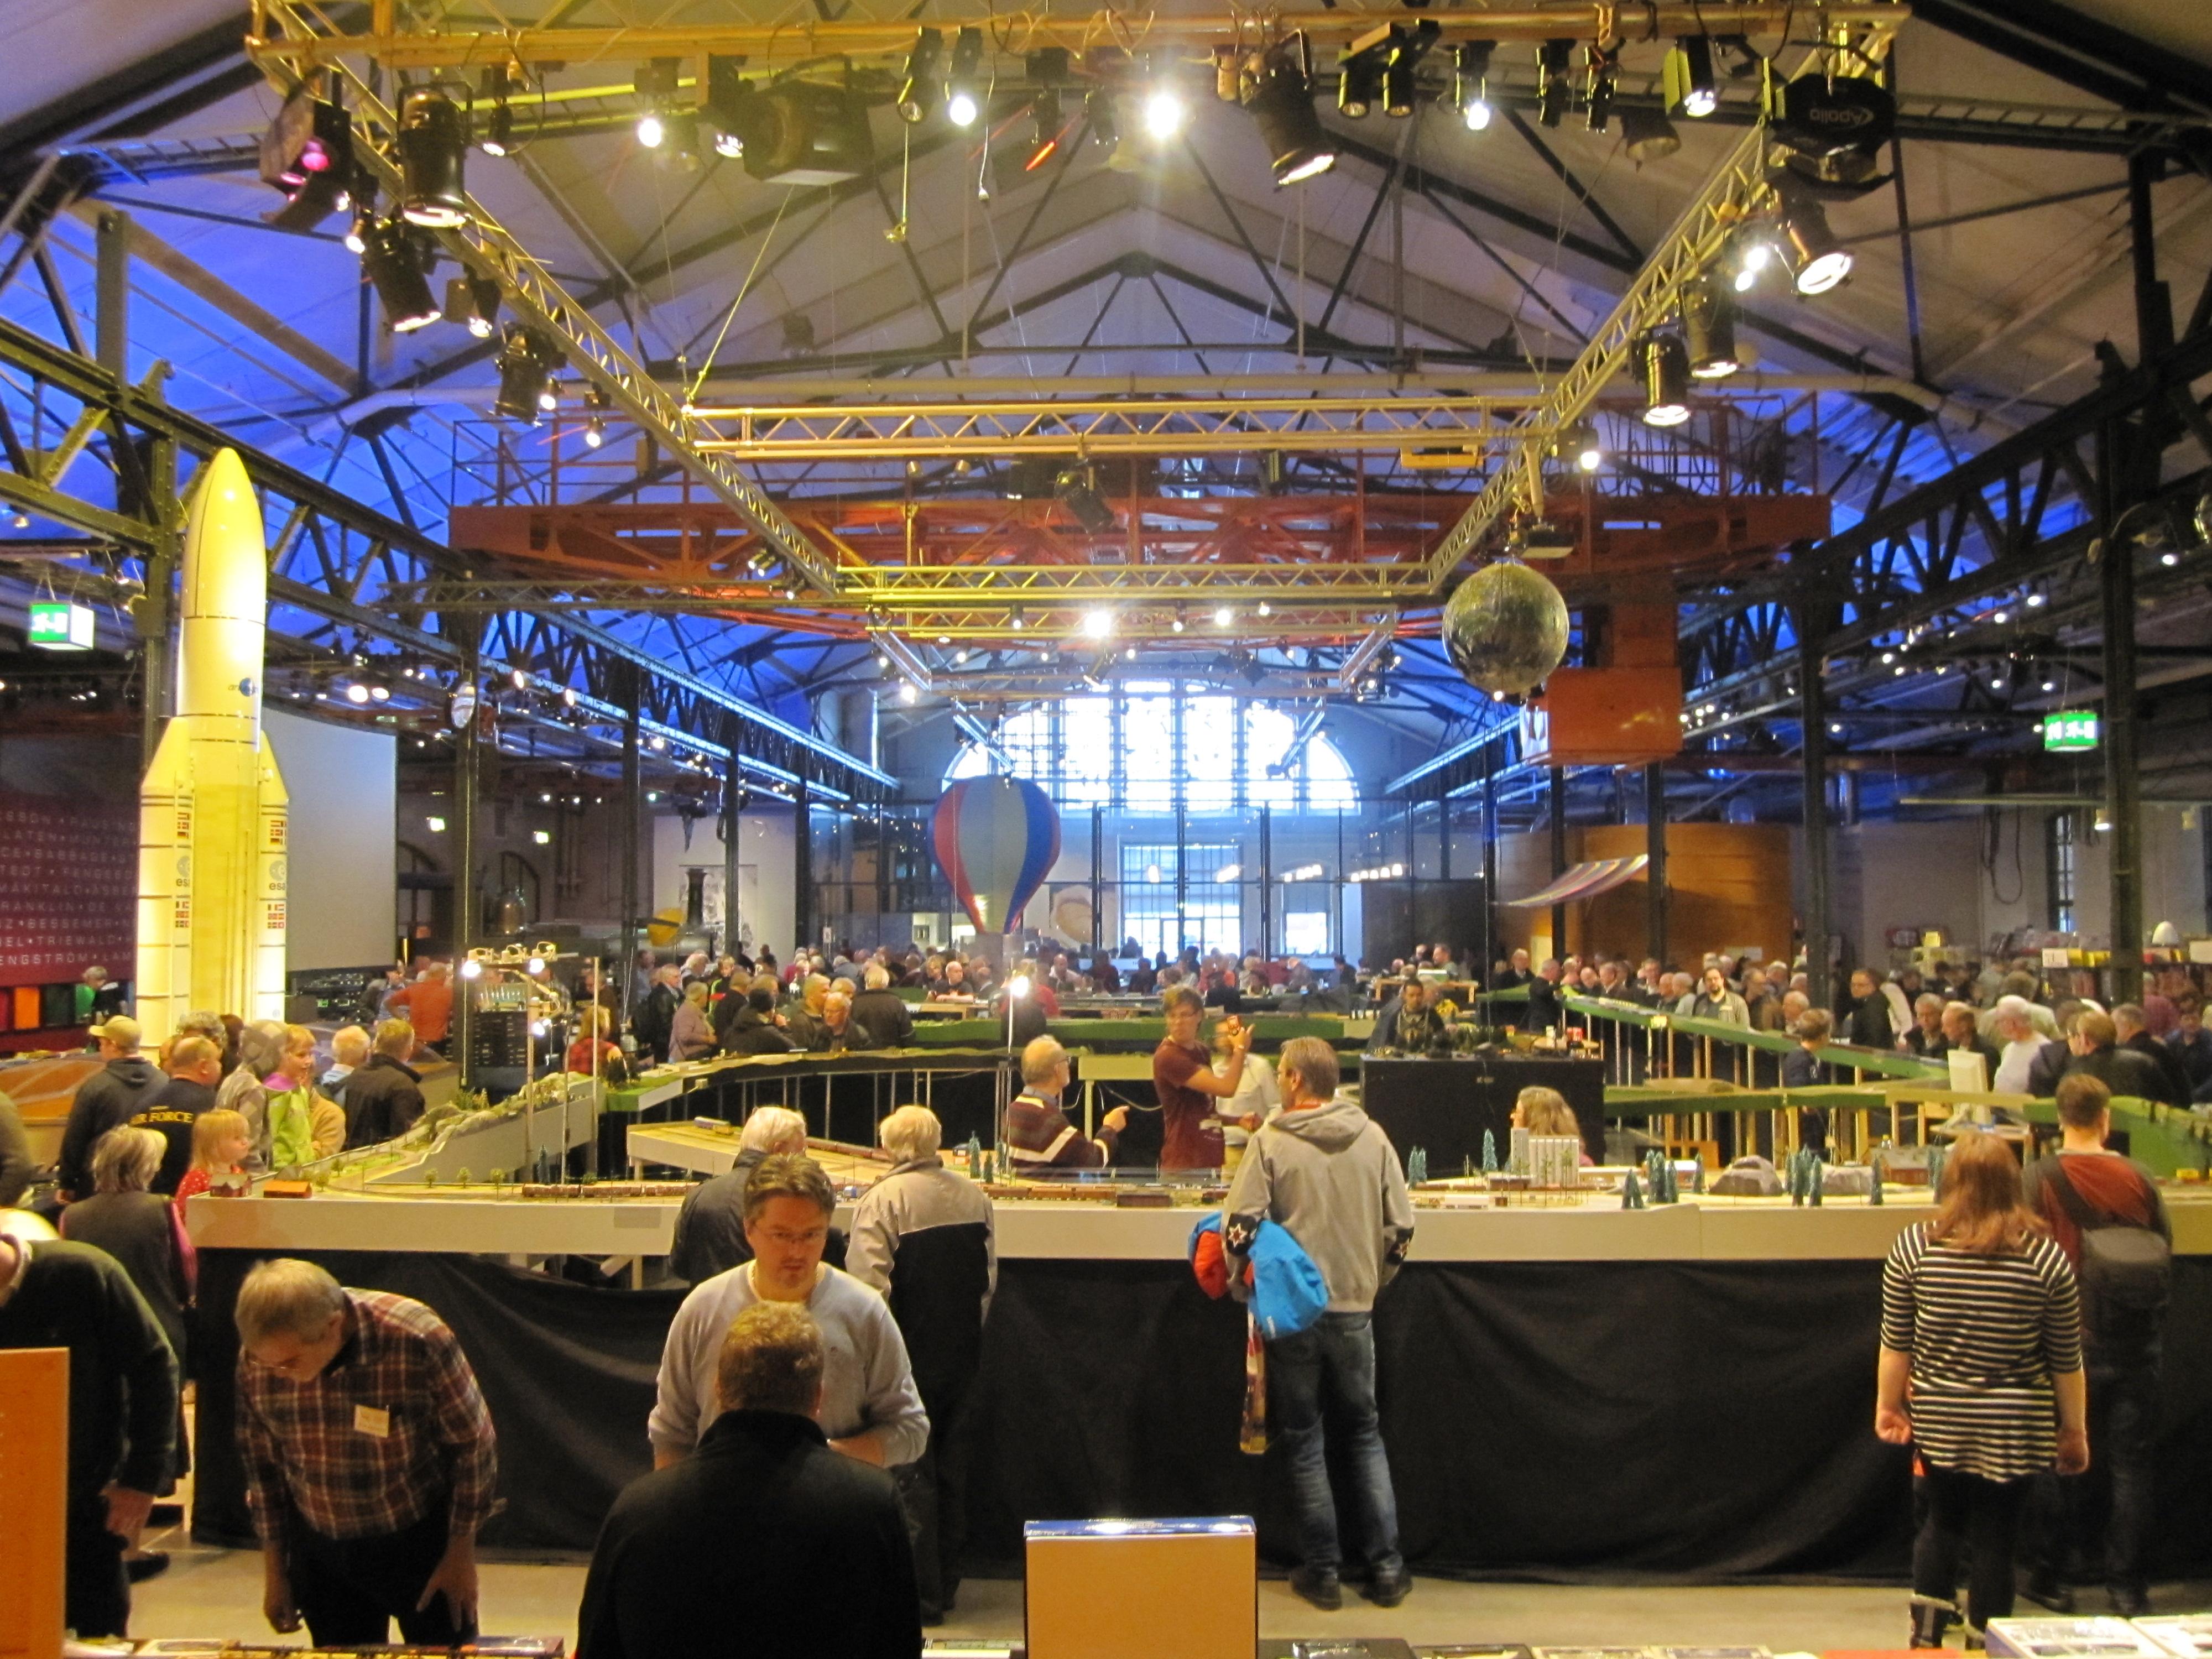 Massa besökare i stora hallen under tågmässan